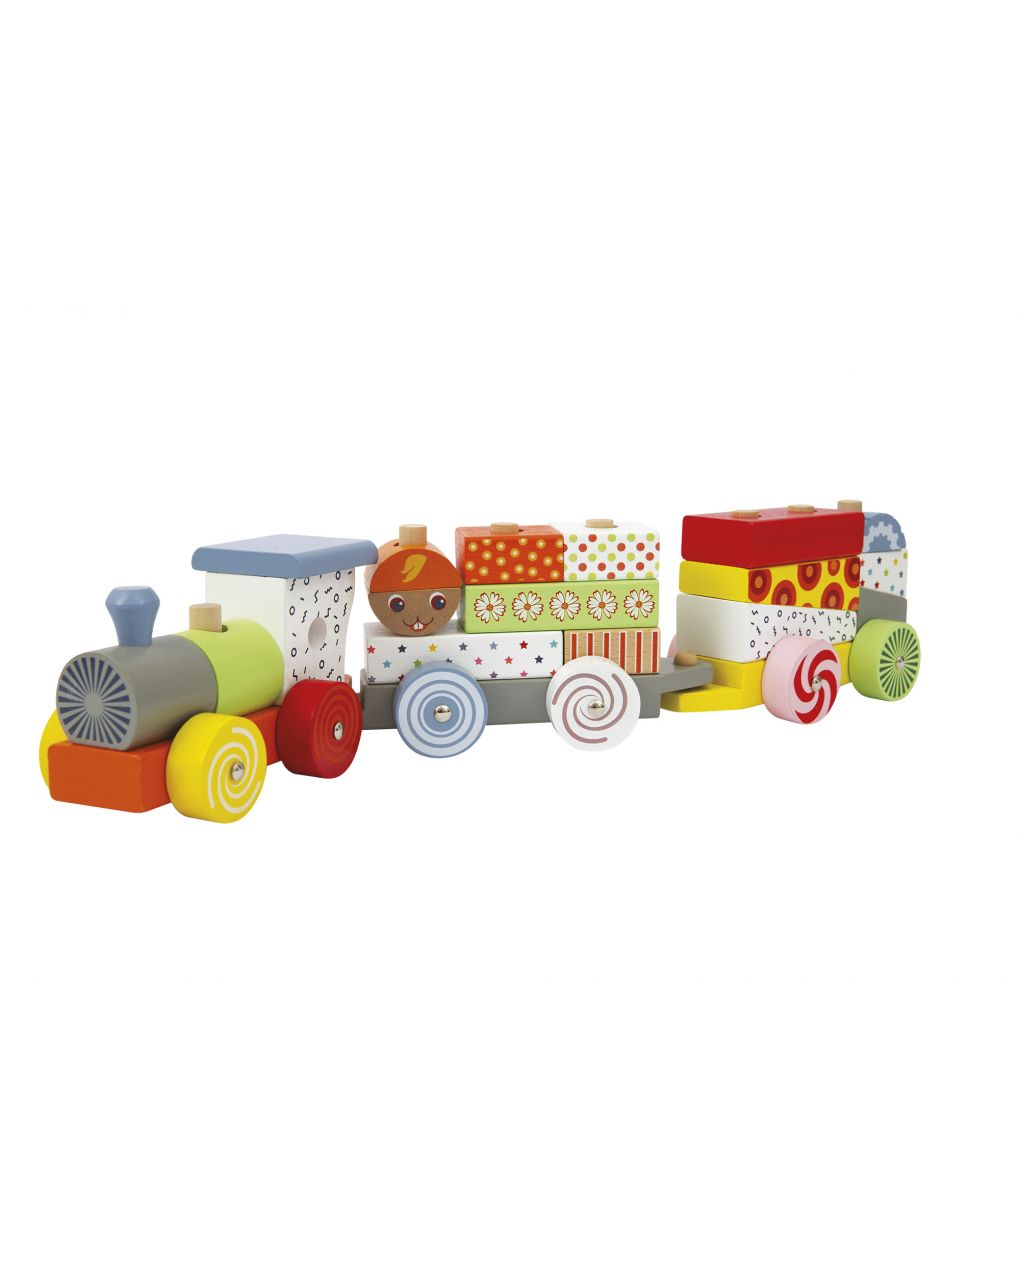 Wood'n play - teddy train - Wood'N'Play